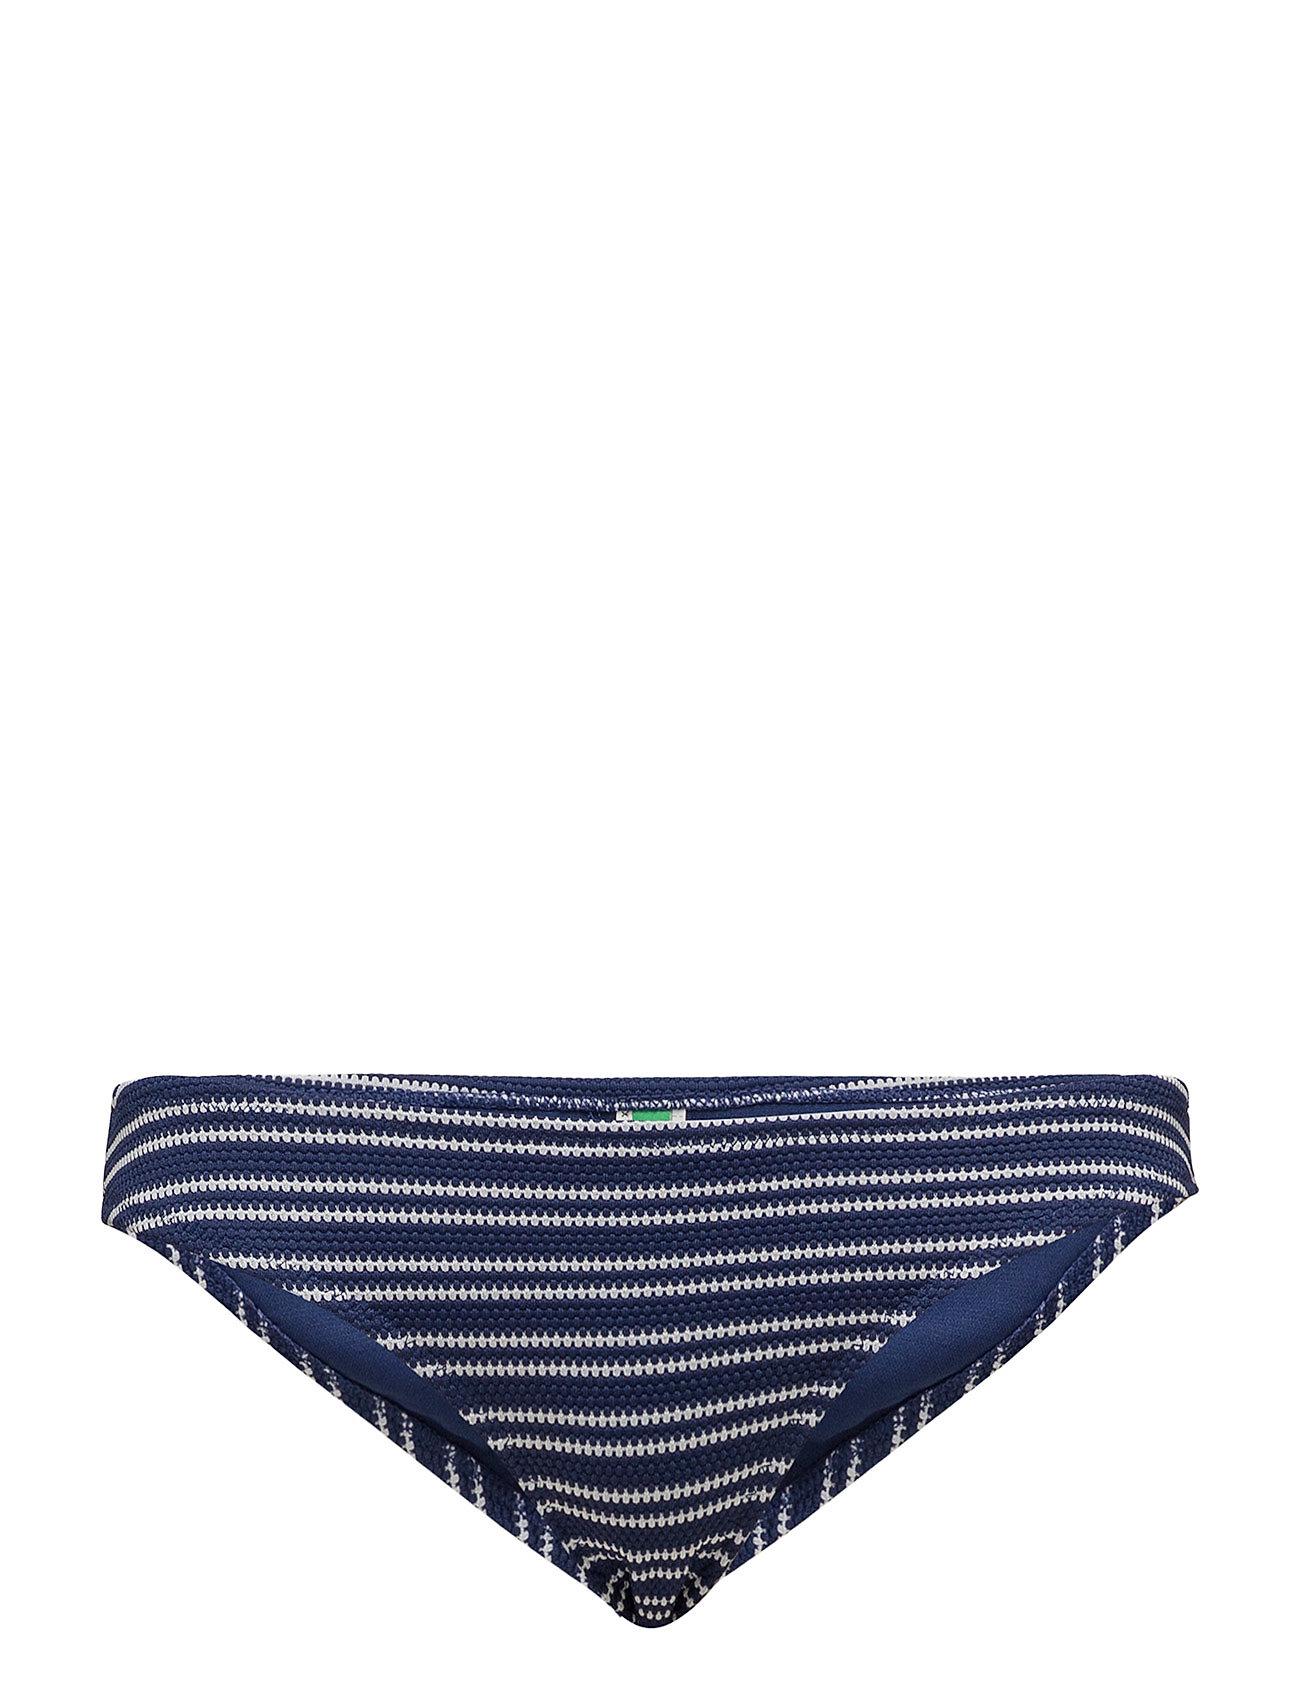 ef5c6089 United Colors of Benetton Swimming Briefs (7z7), 74.50 kr   Stort ...